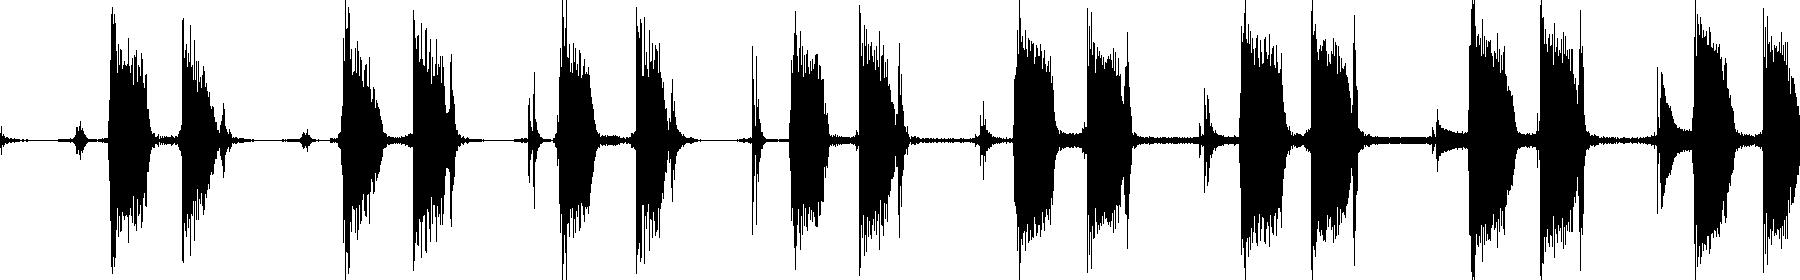 guitarreggae03 120